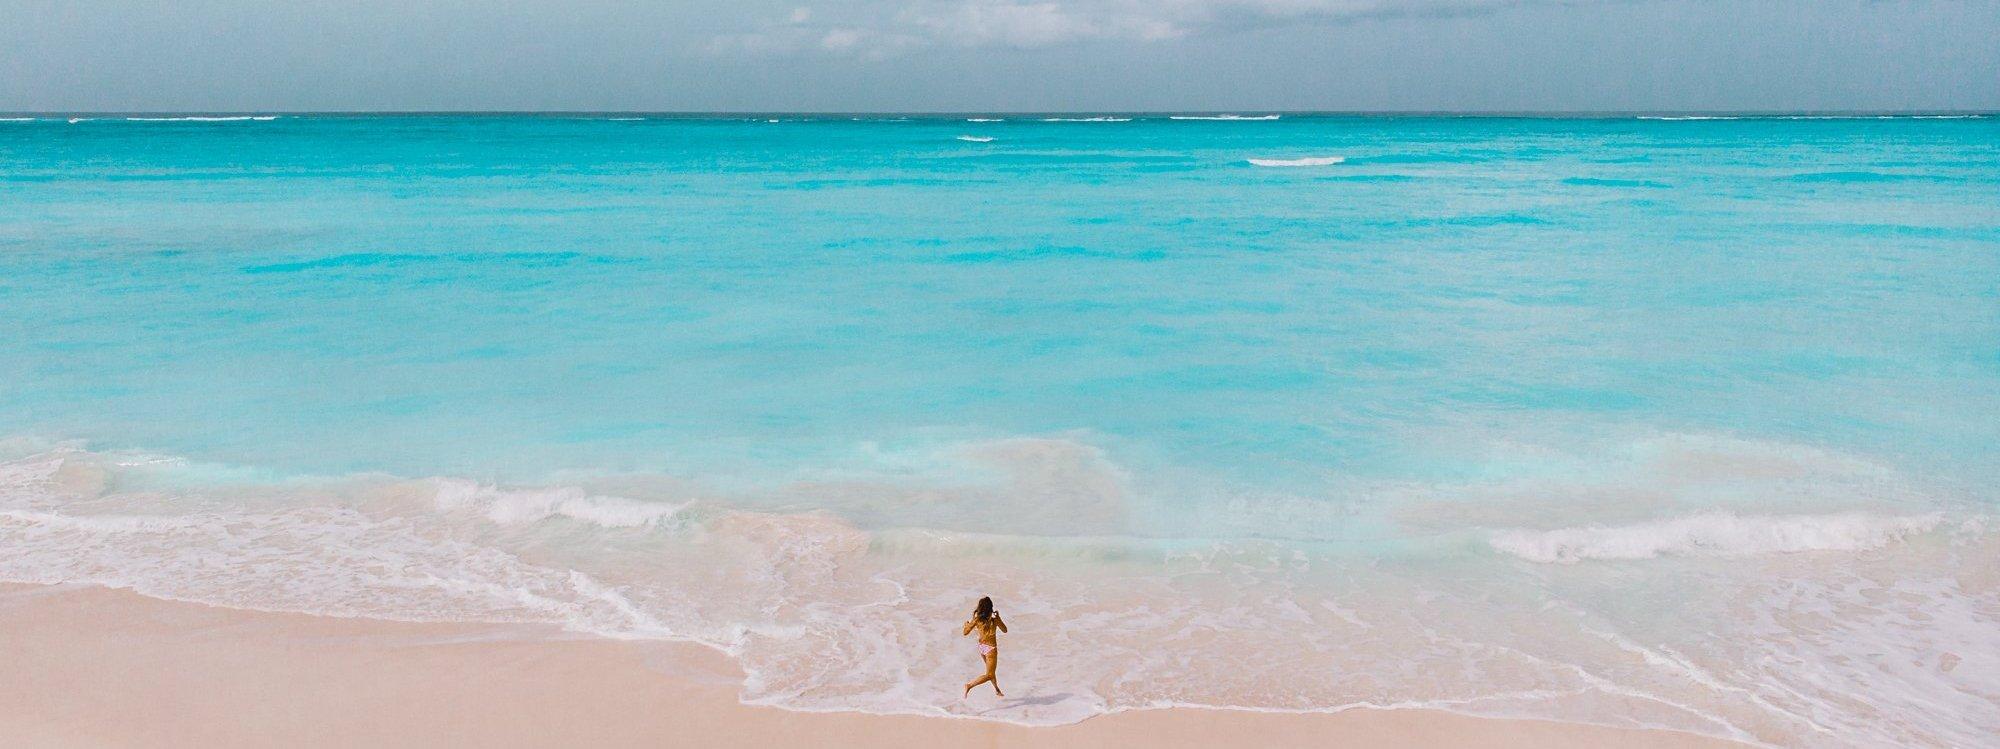 Tbt_traveljyoshankar_turksandcaicos_travelguide_travelblogger_caribbeancruisin_tci_6a